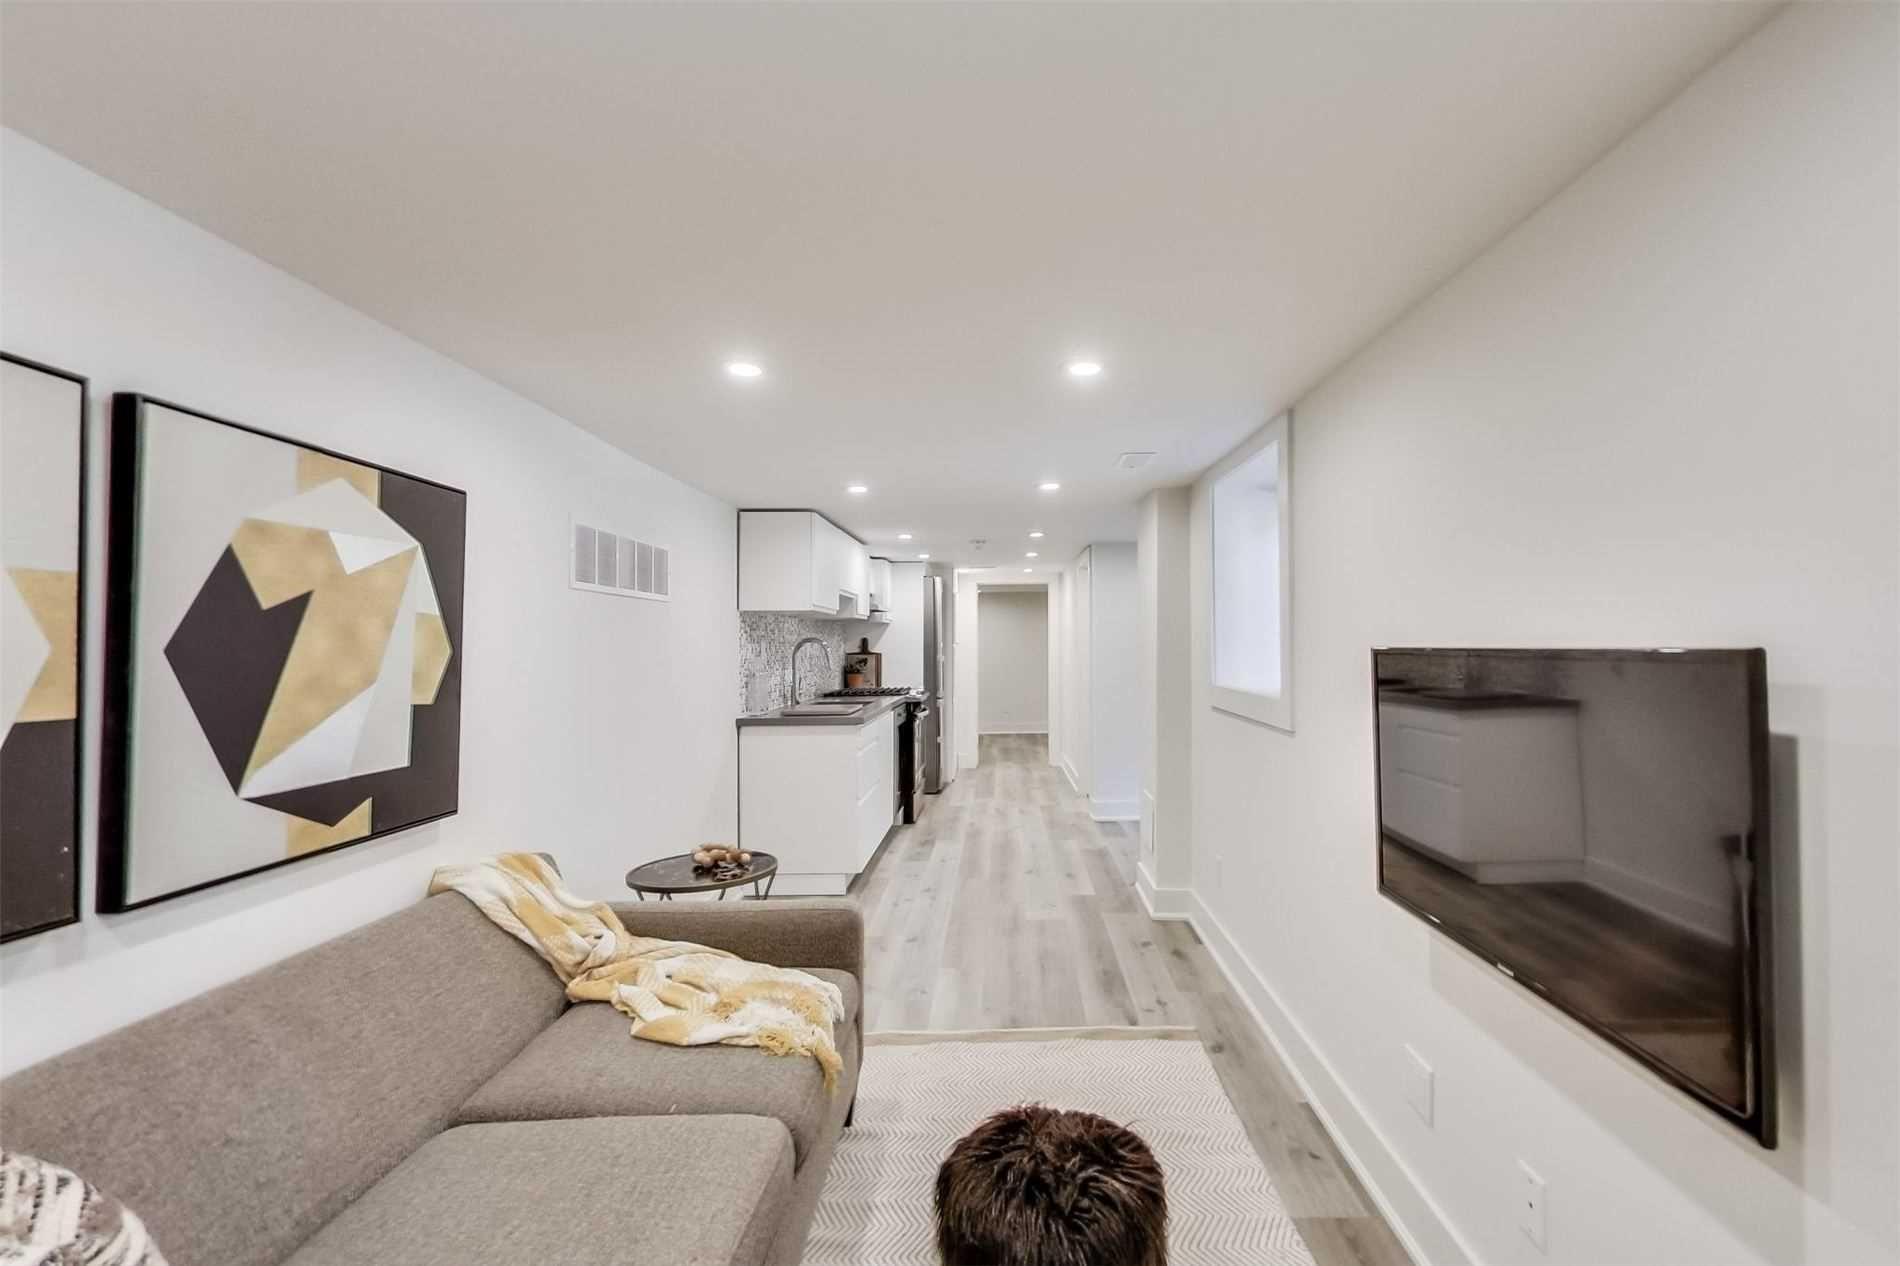 Photo 5: Photos: 501B Carlaw Avenue in Toronto: South Riverdale House (2 1/2 Storey) for lease (Toronto E01)  : MLS®# E4800704